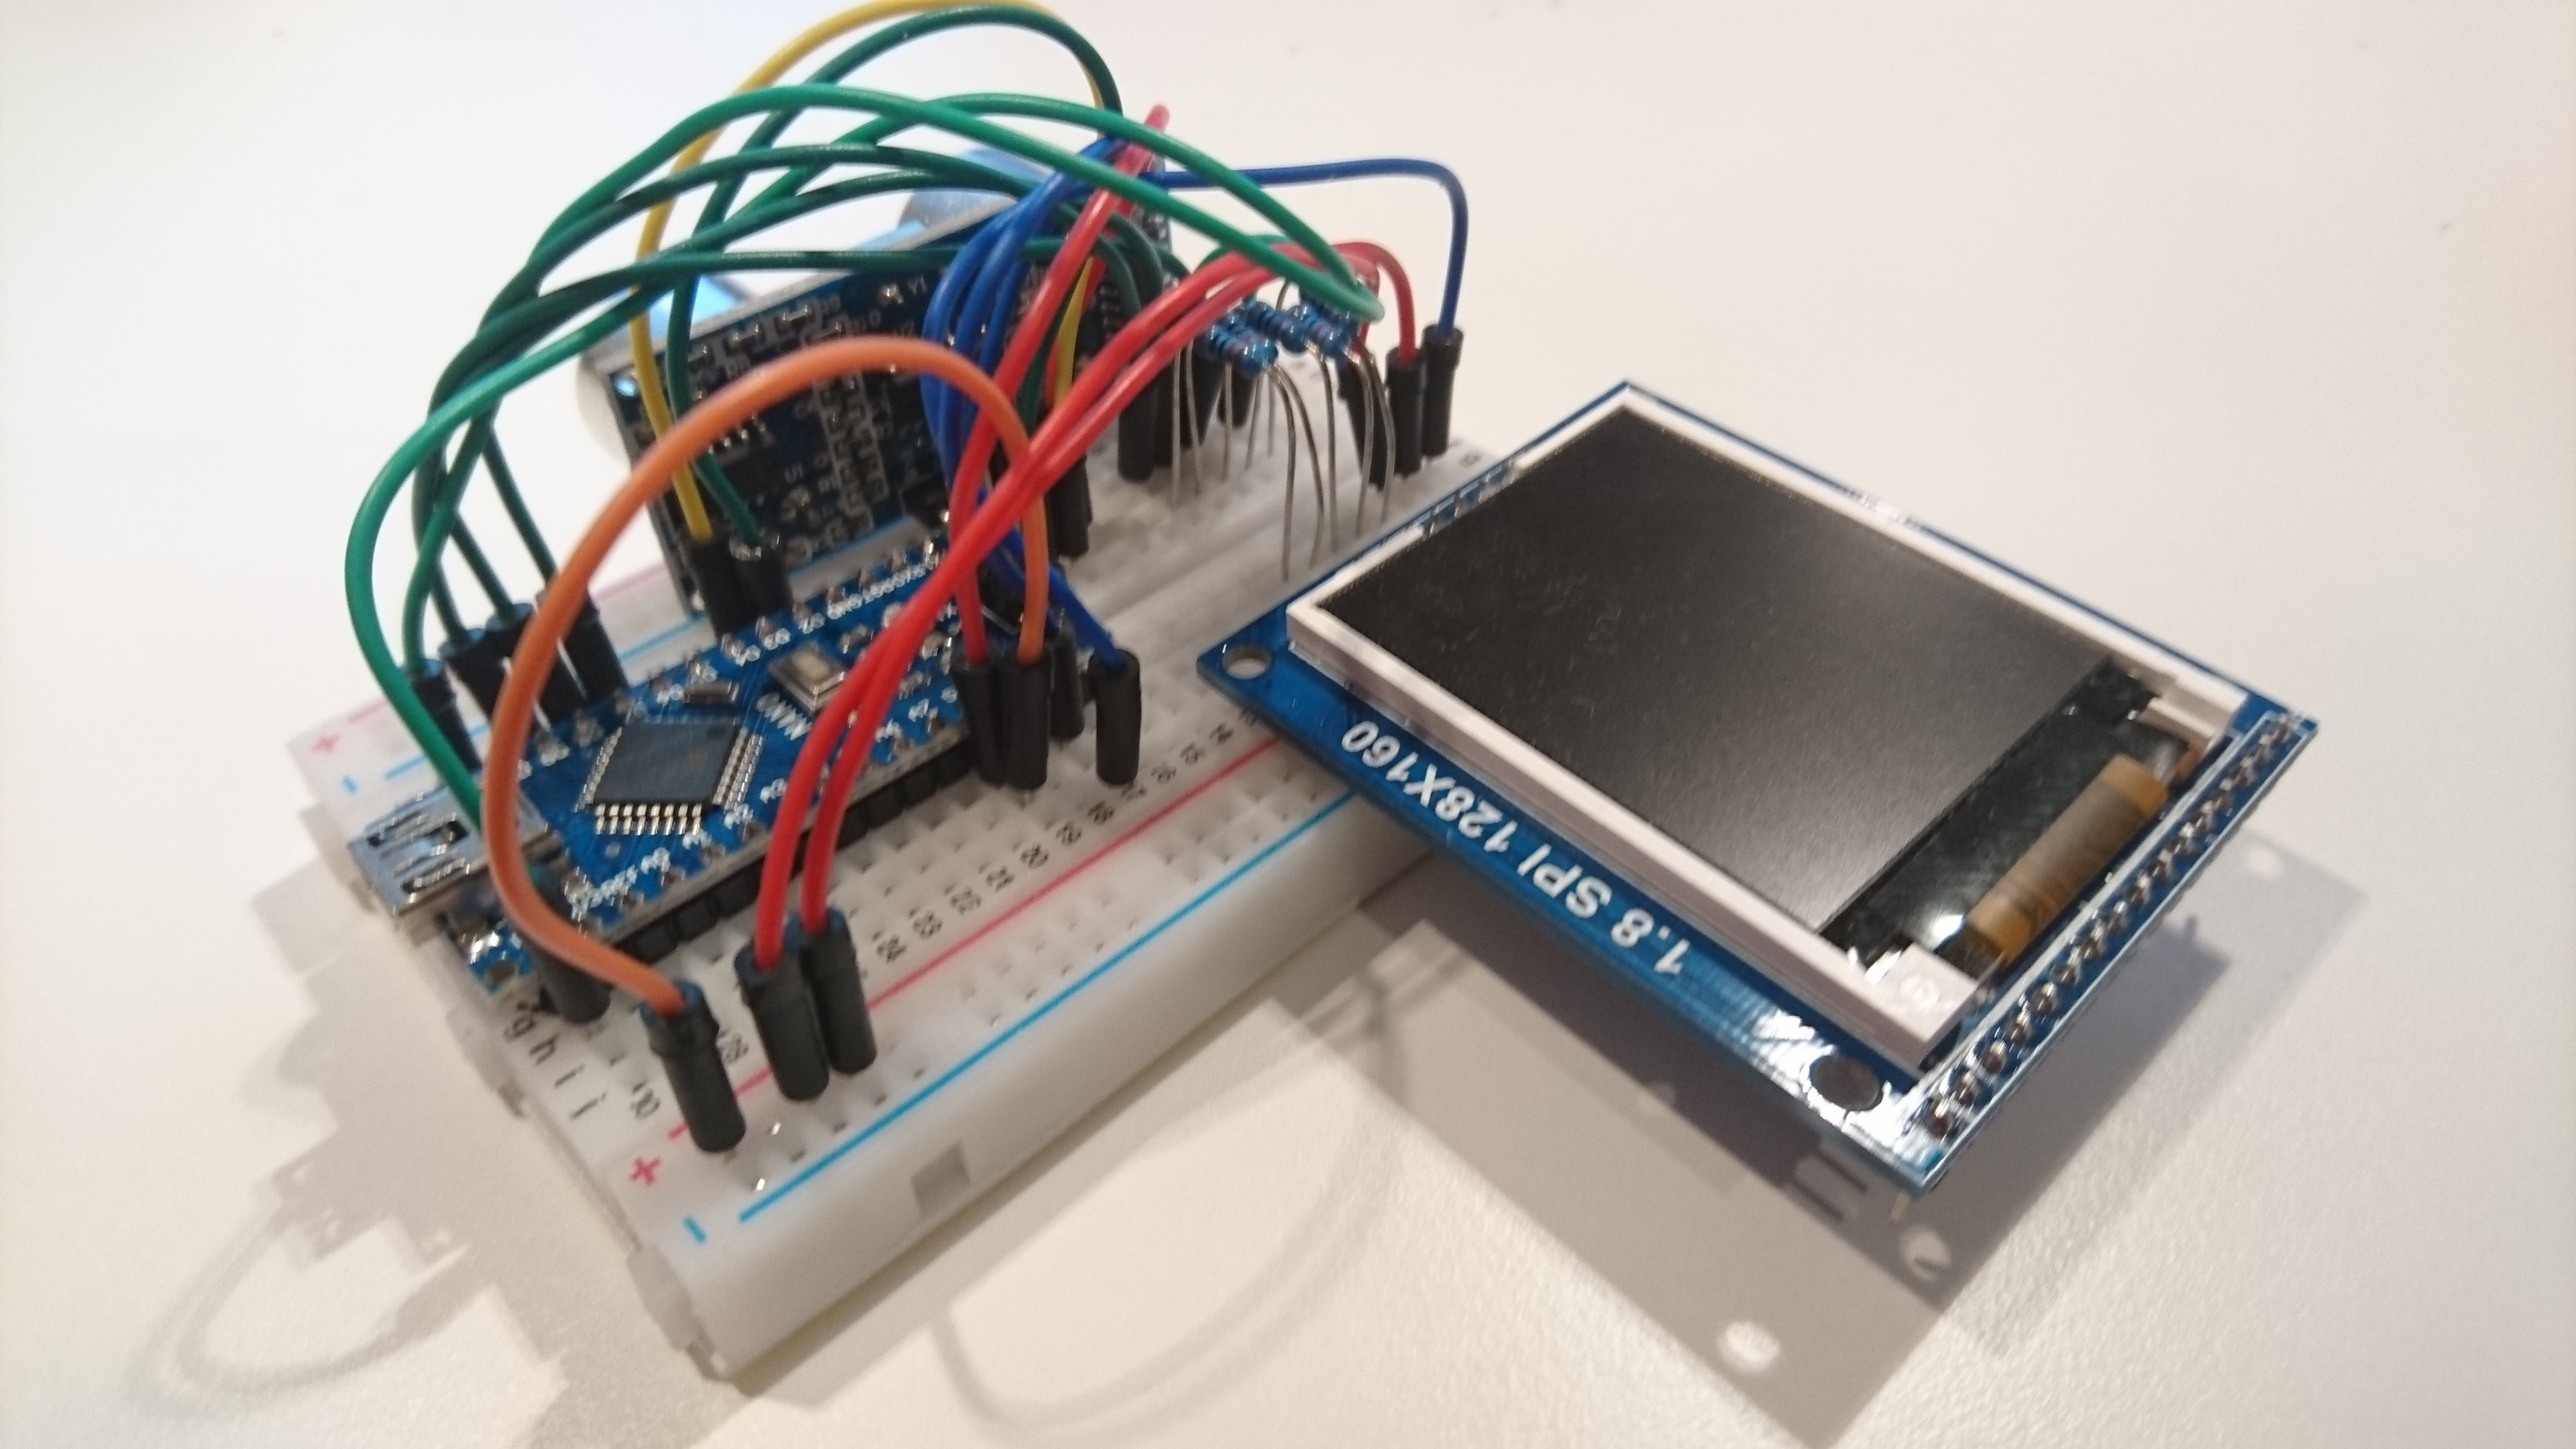 ArduinoUltrasonicDistanceMeter_4-e1540844140775